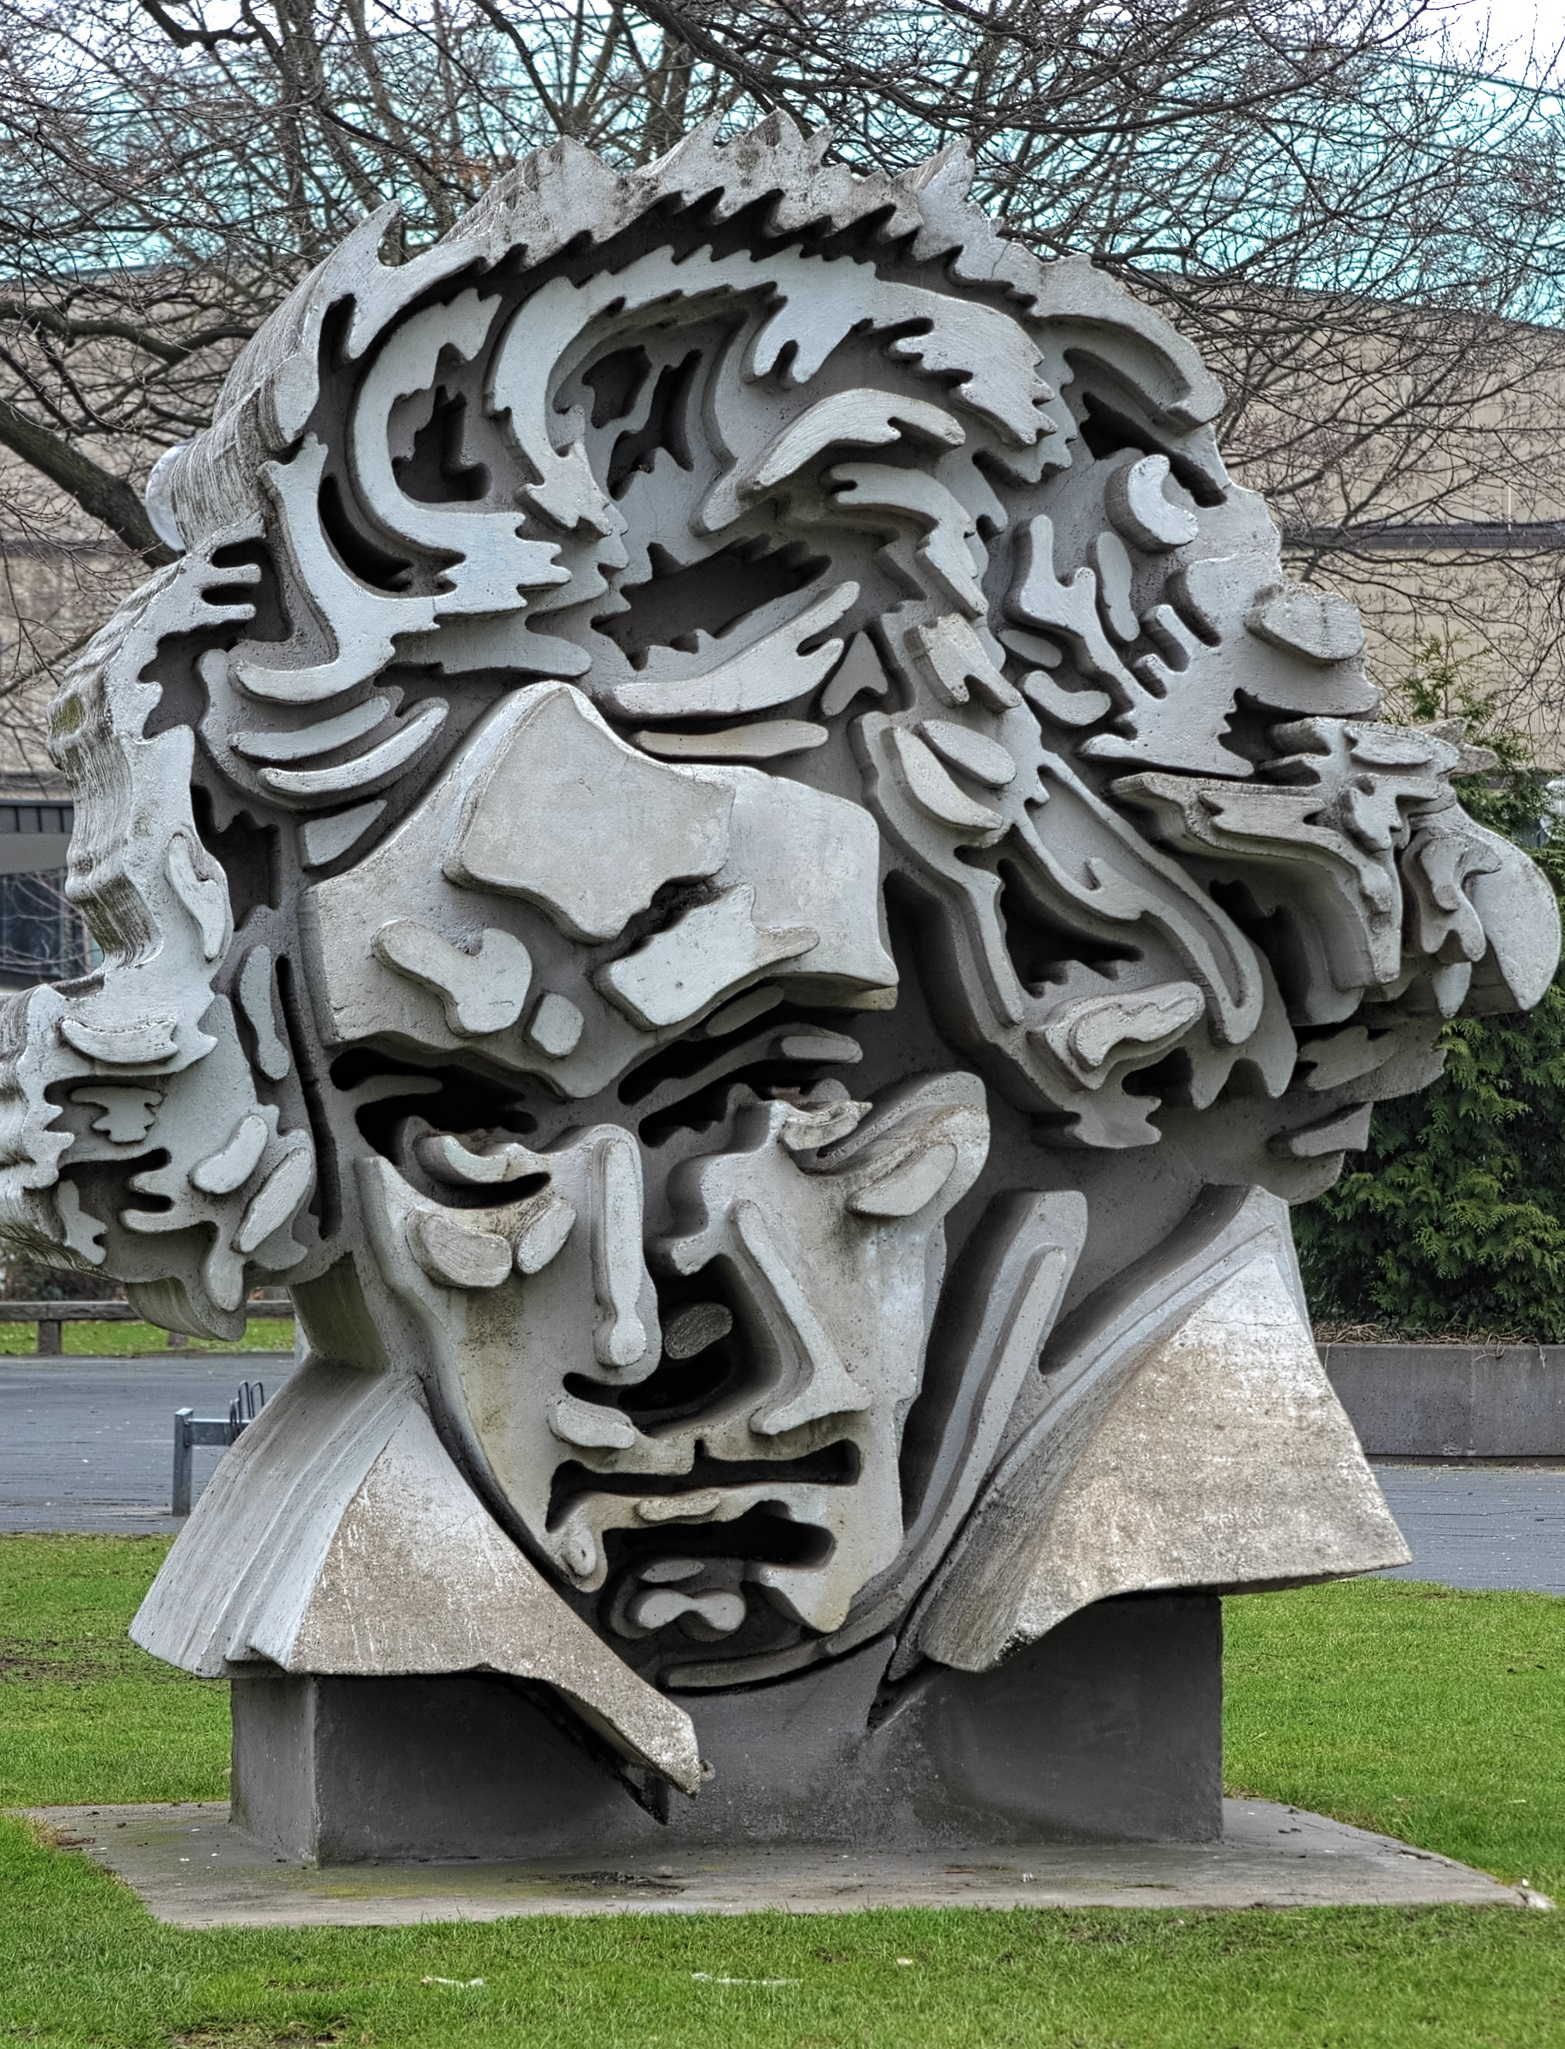 Image illustrating Beethoven statue in Bonn/Germany © Mikhail Markovskiy / Shutterstock.com